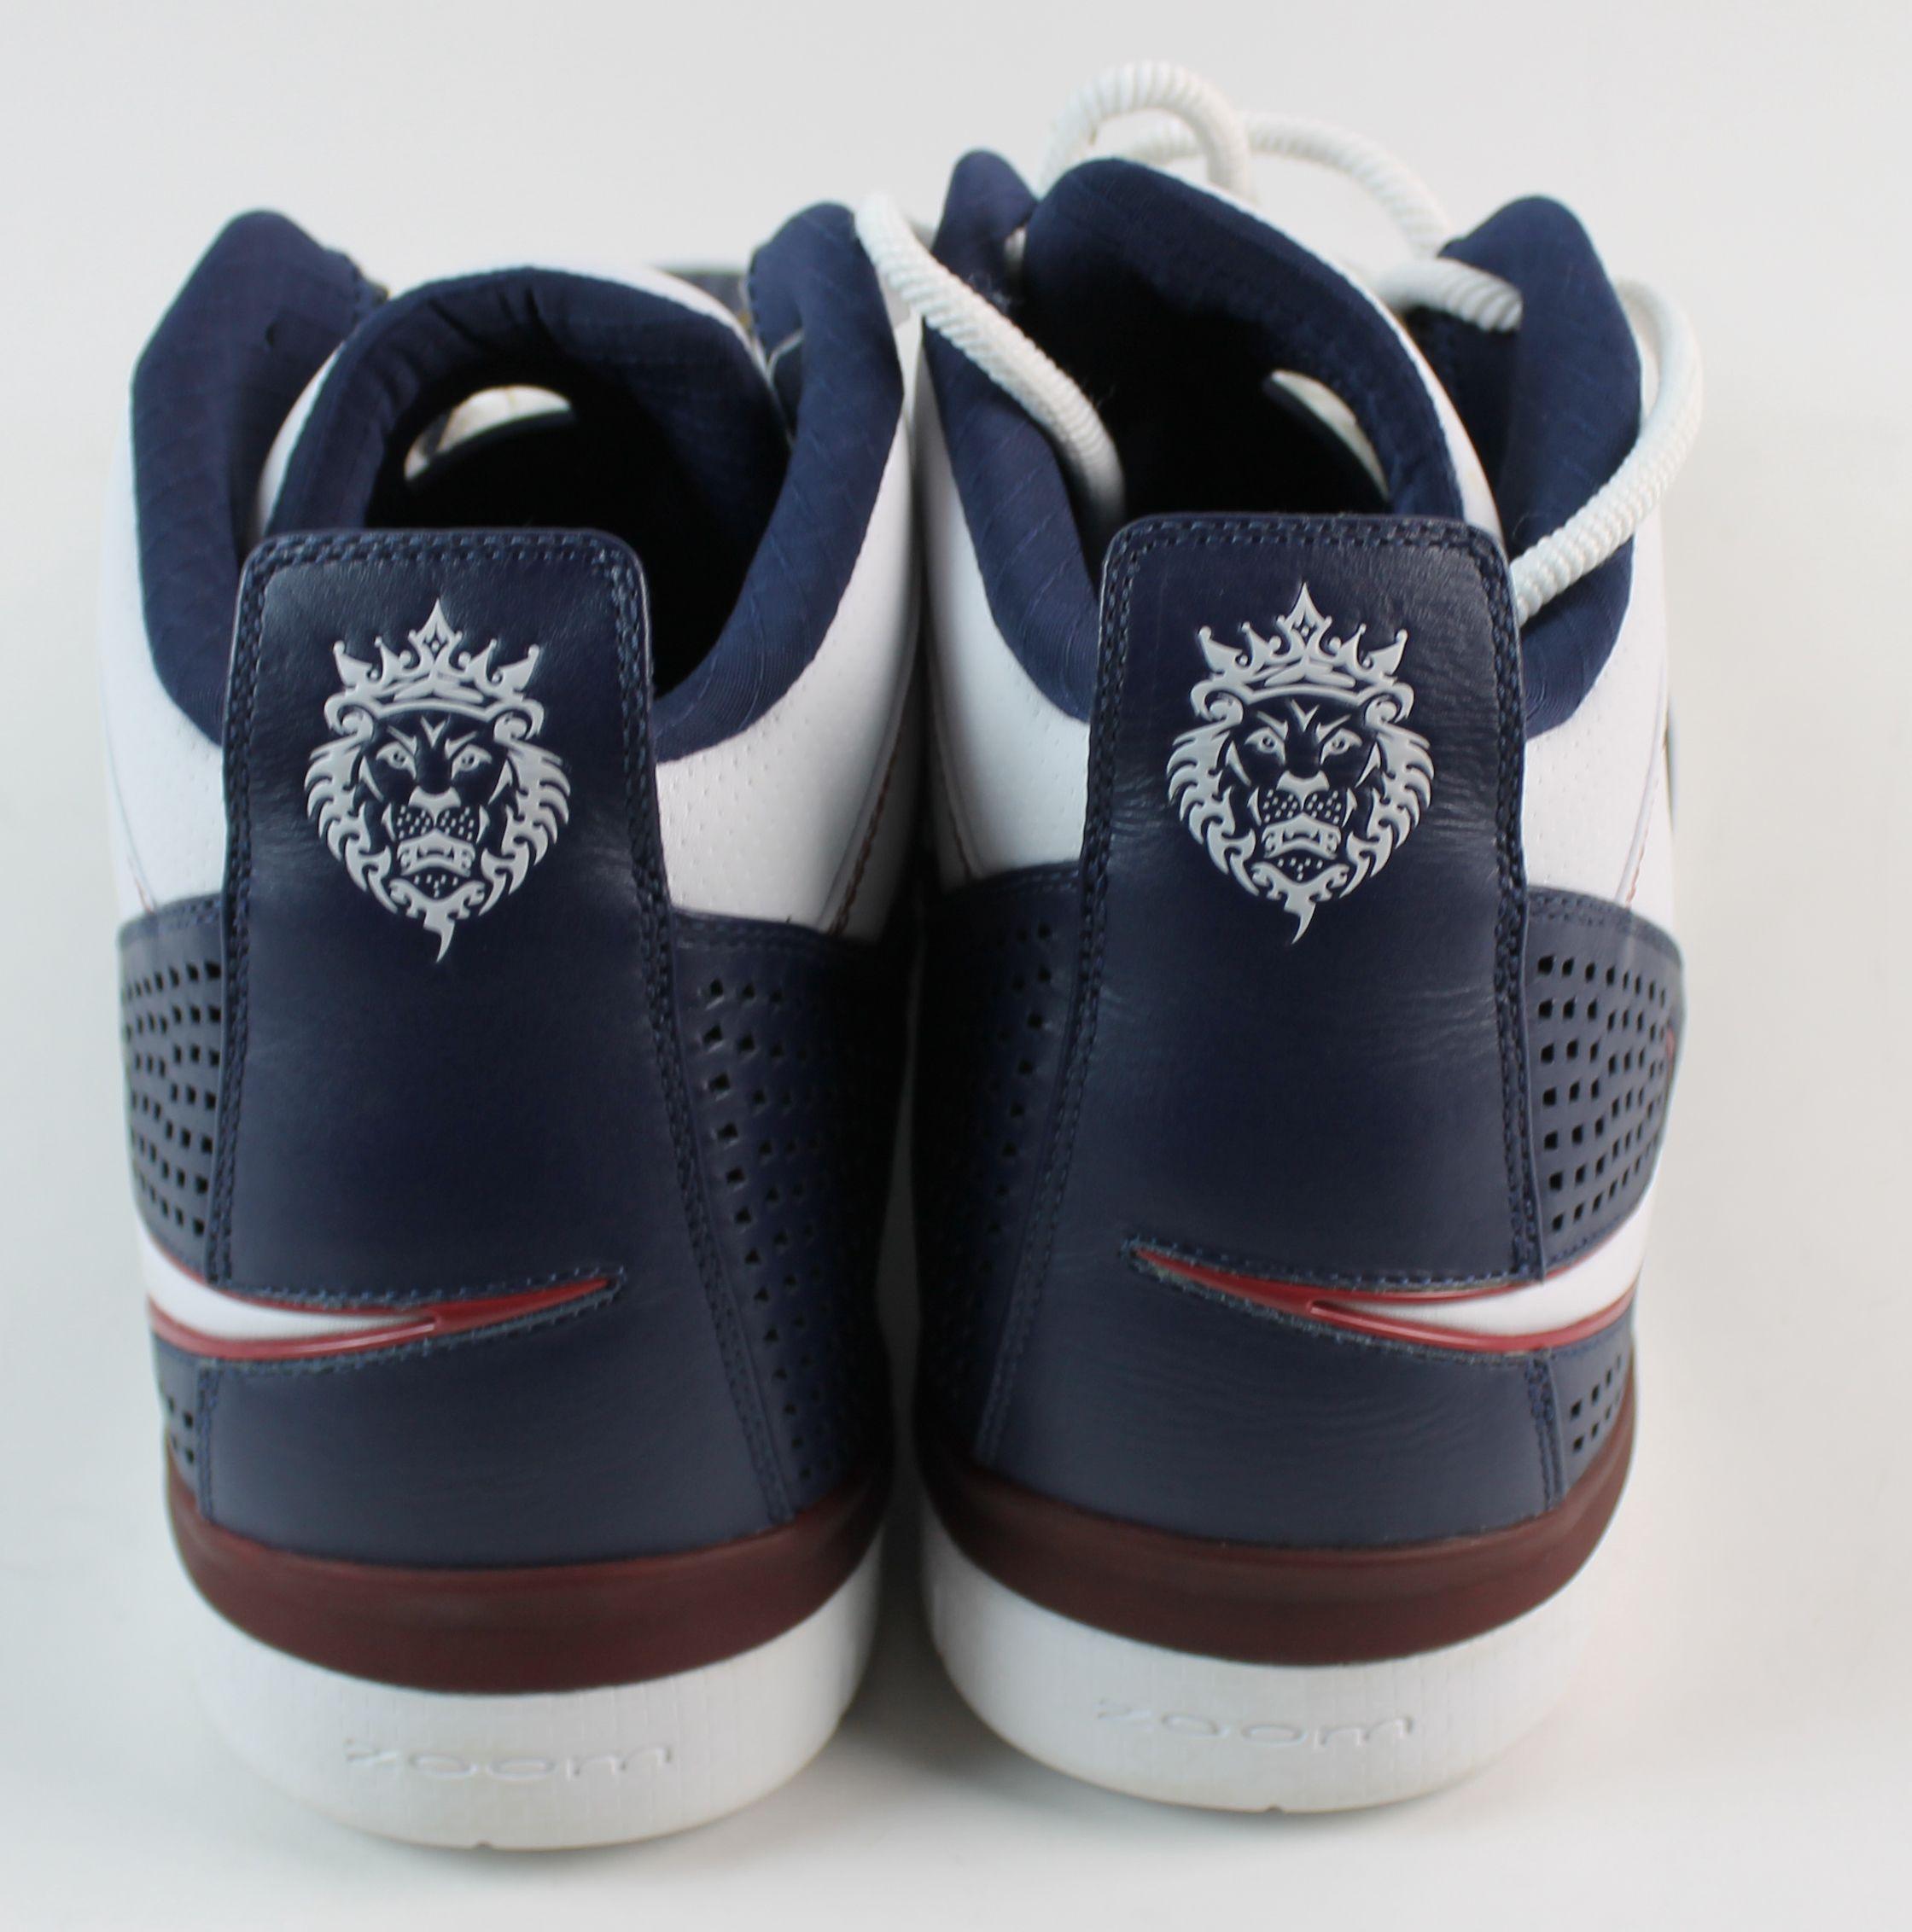 30122bf1e7f ... LeBron James Signed   Game Worn 2008 Nike Zoom Shoes w  Rare King James  Signature